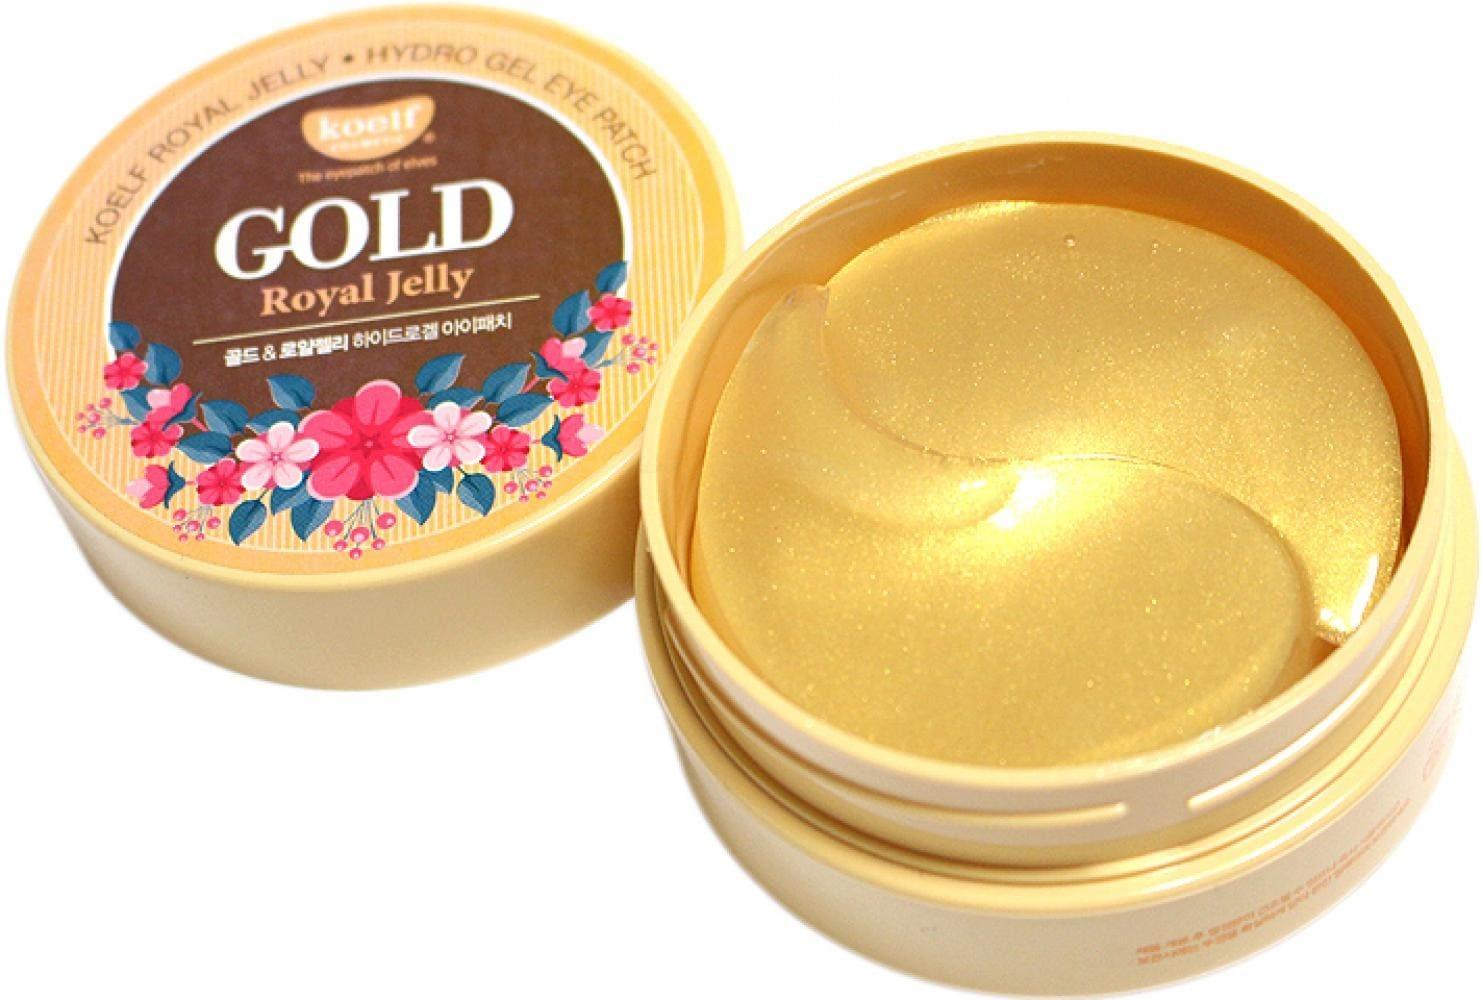 Гидрогелевые патчи для век Petitfee Koelf Gold & Royal Jelly Eye Patch